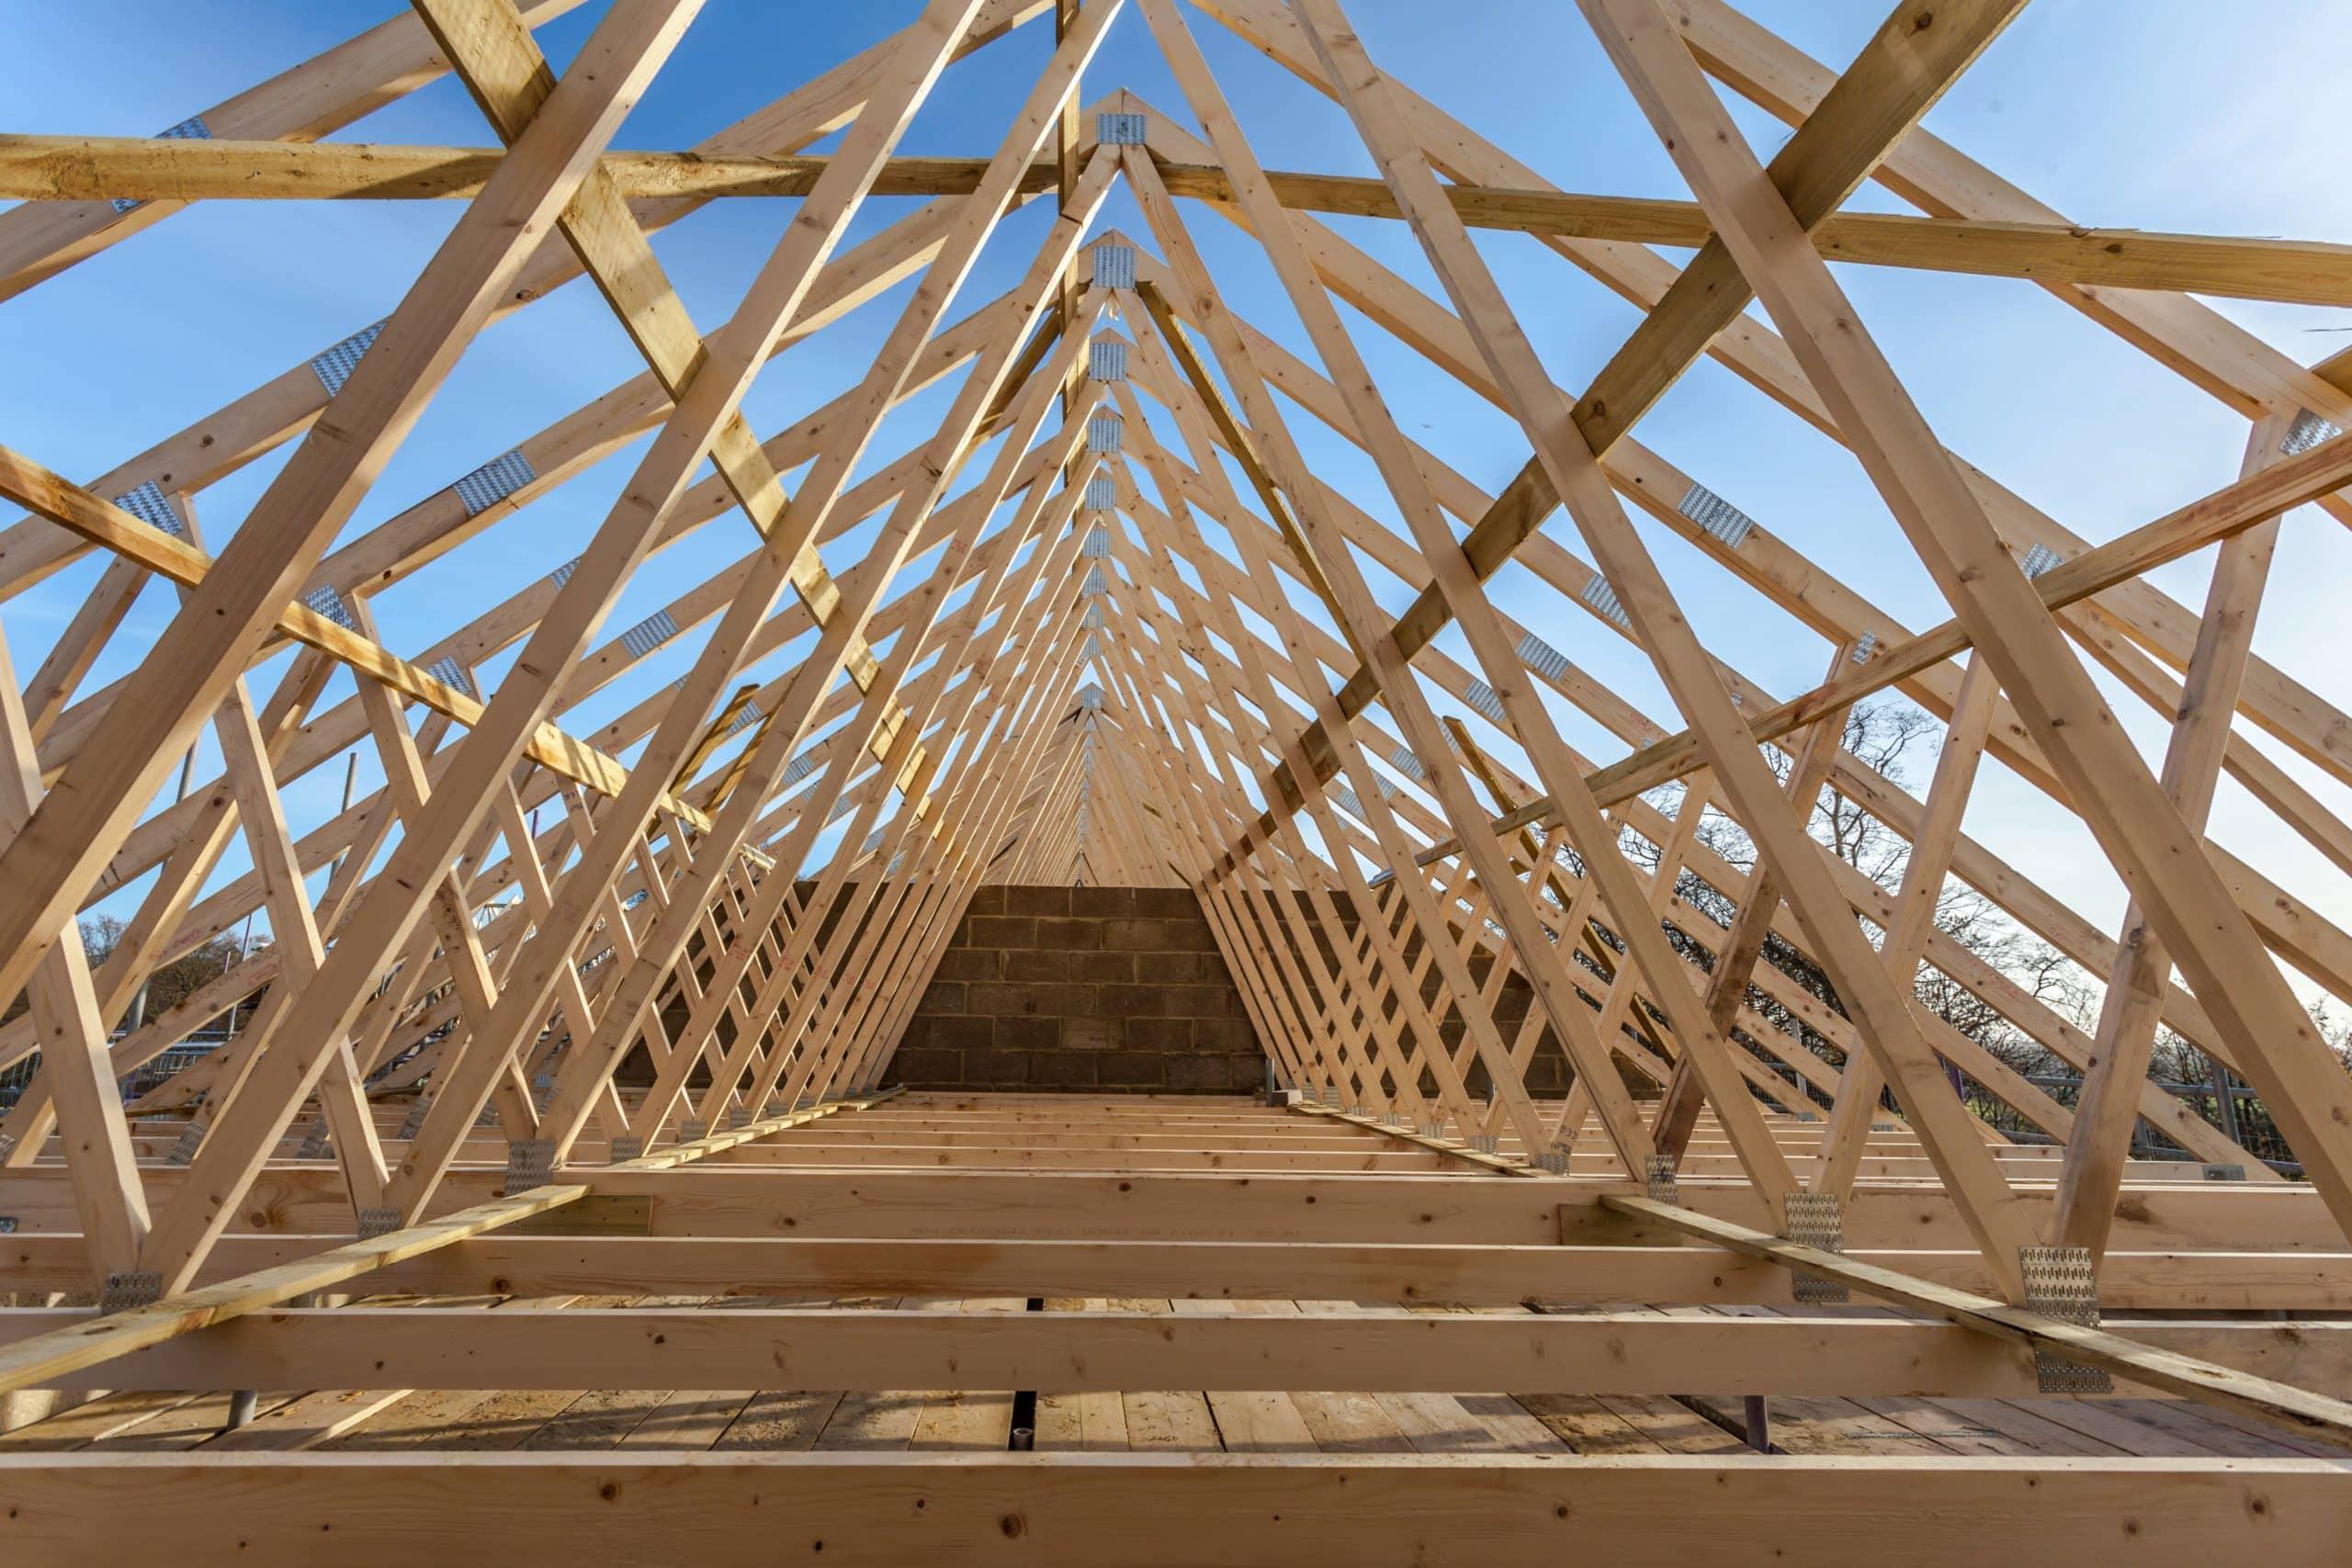 Roof truss